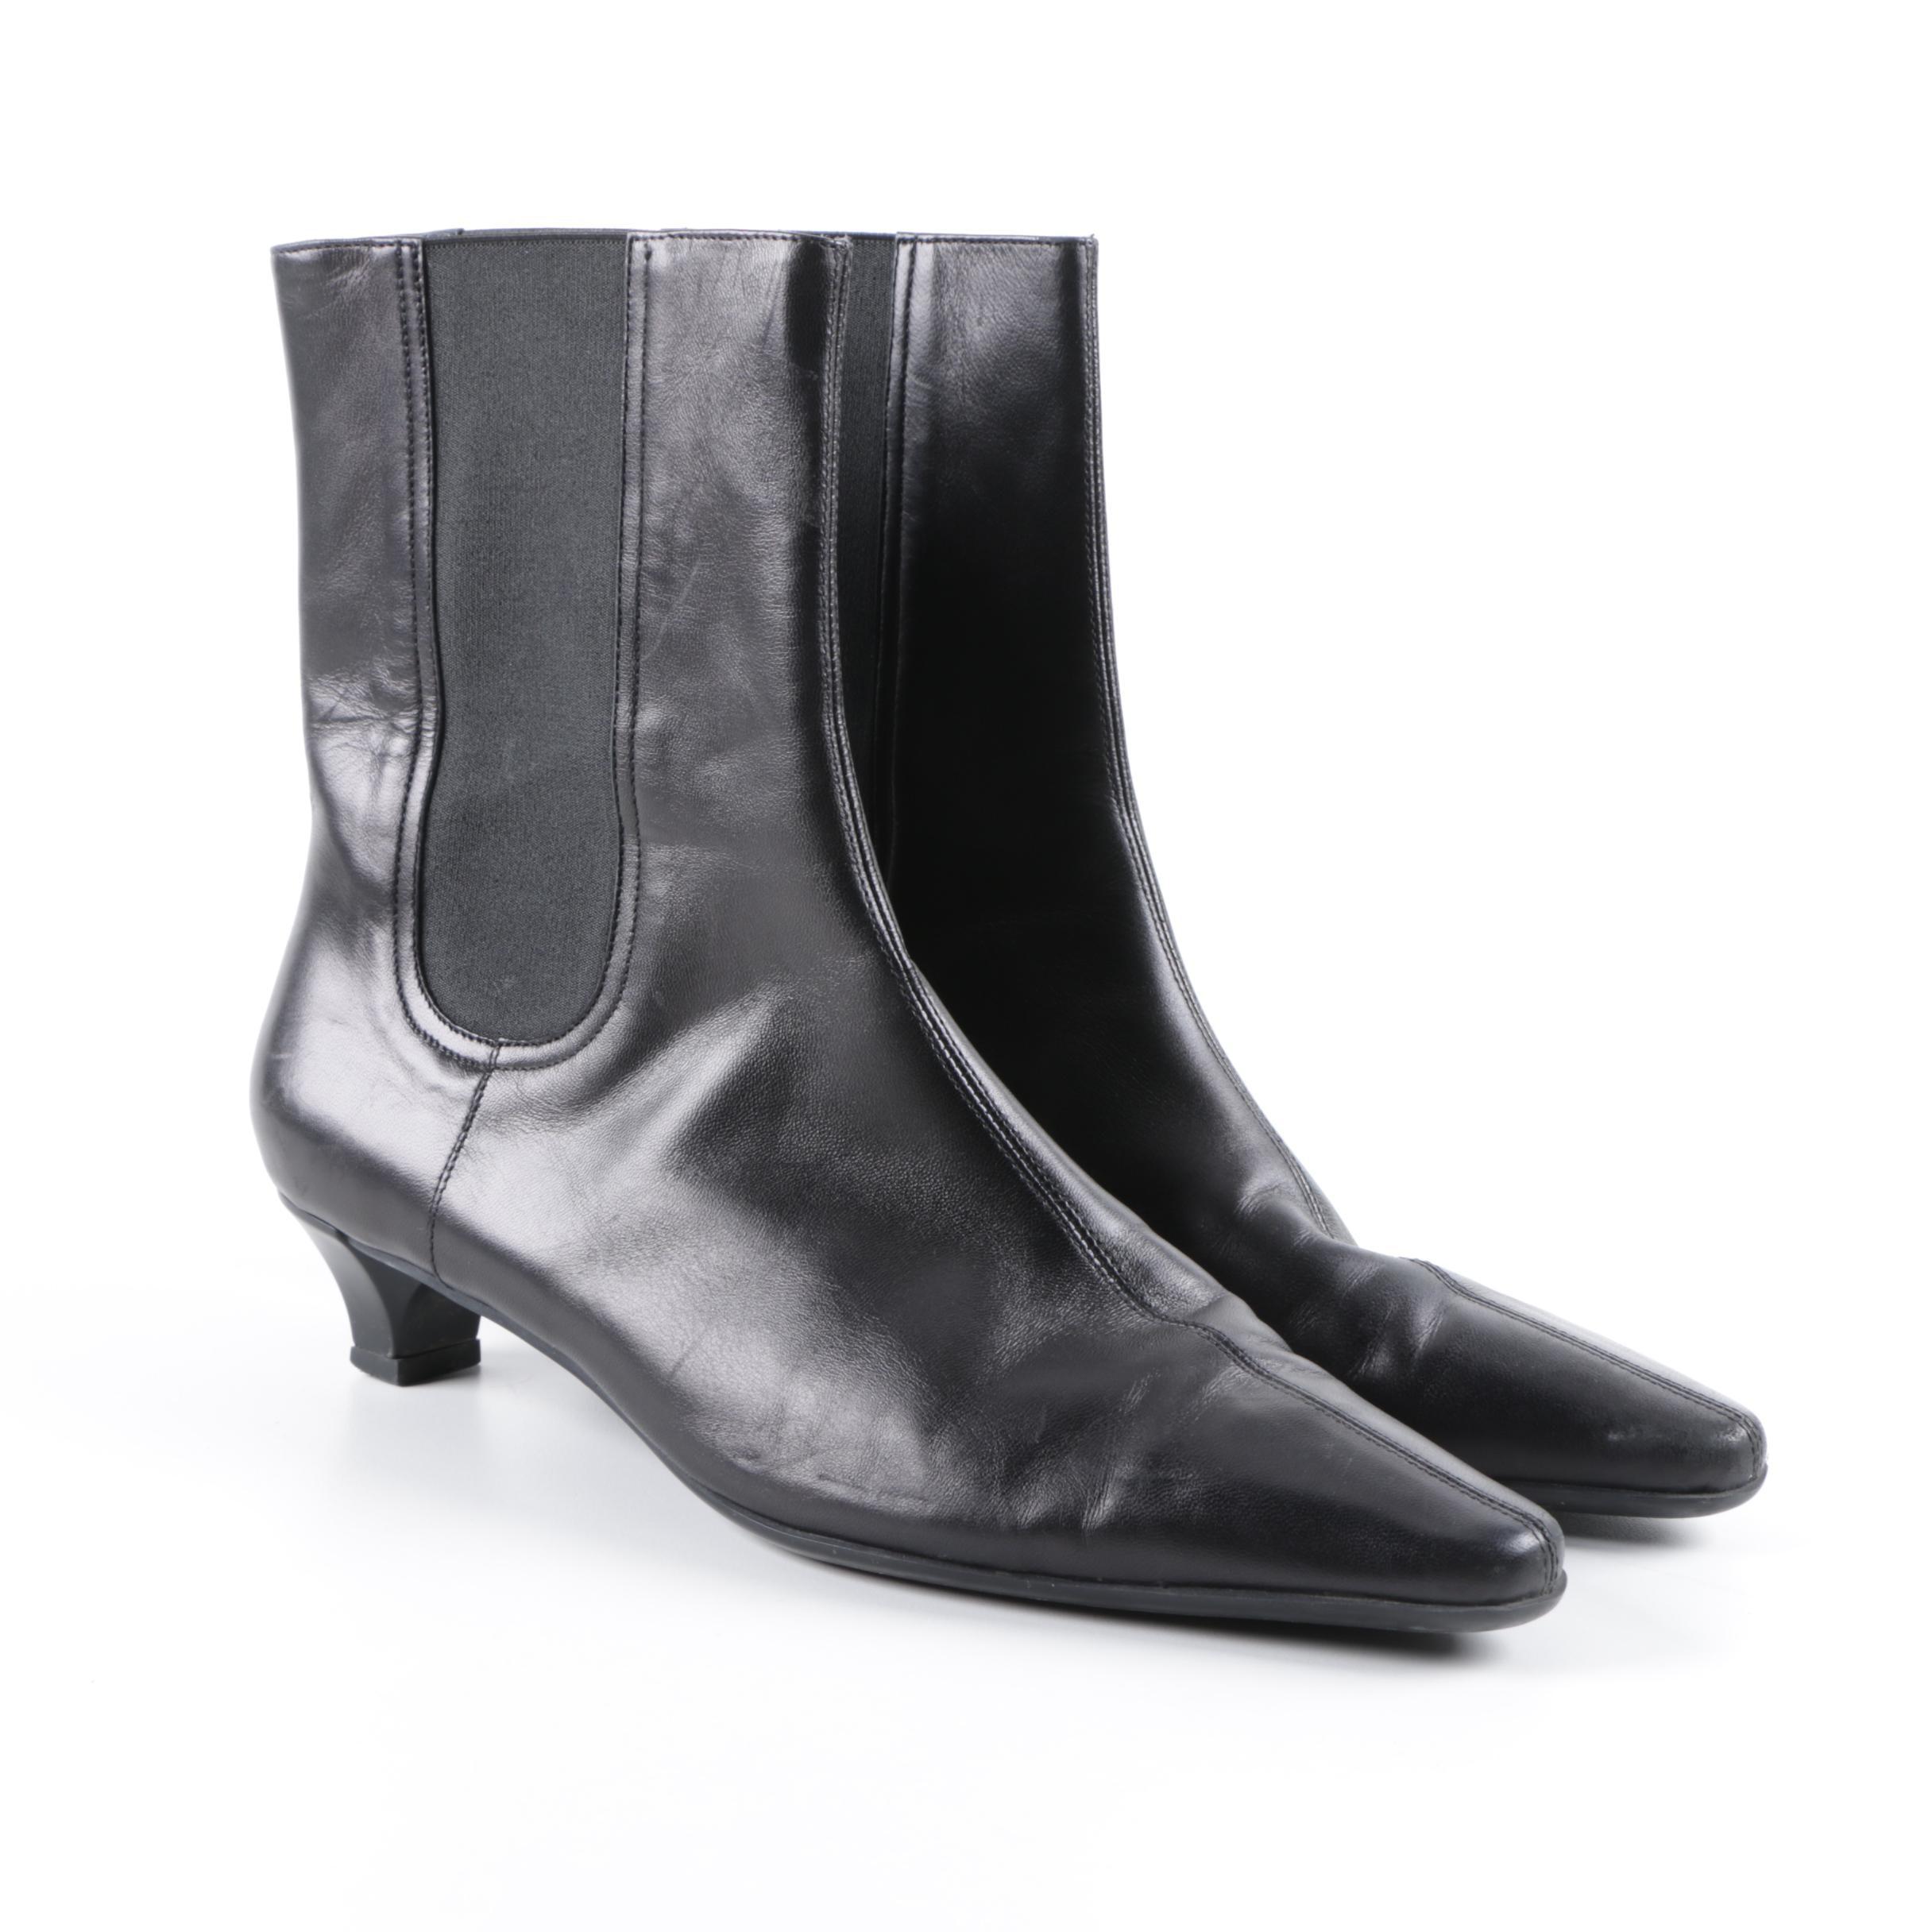 Women's Salvatore Ferragamo Black Leather Chelsea Boots